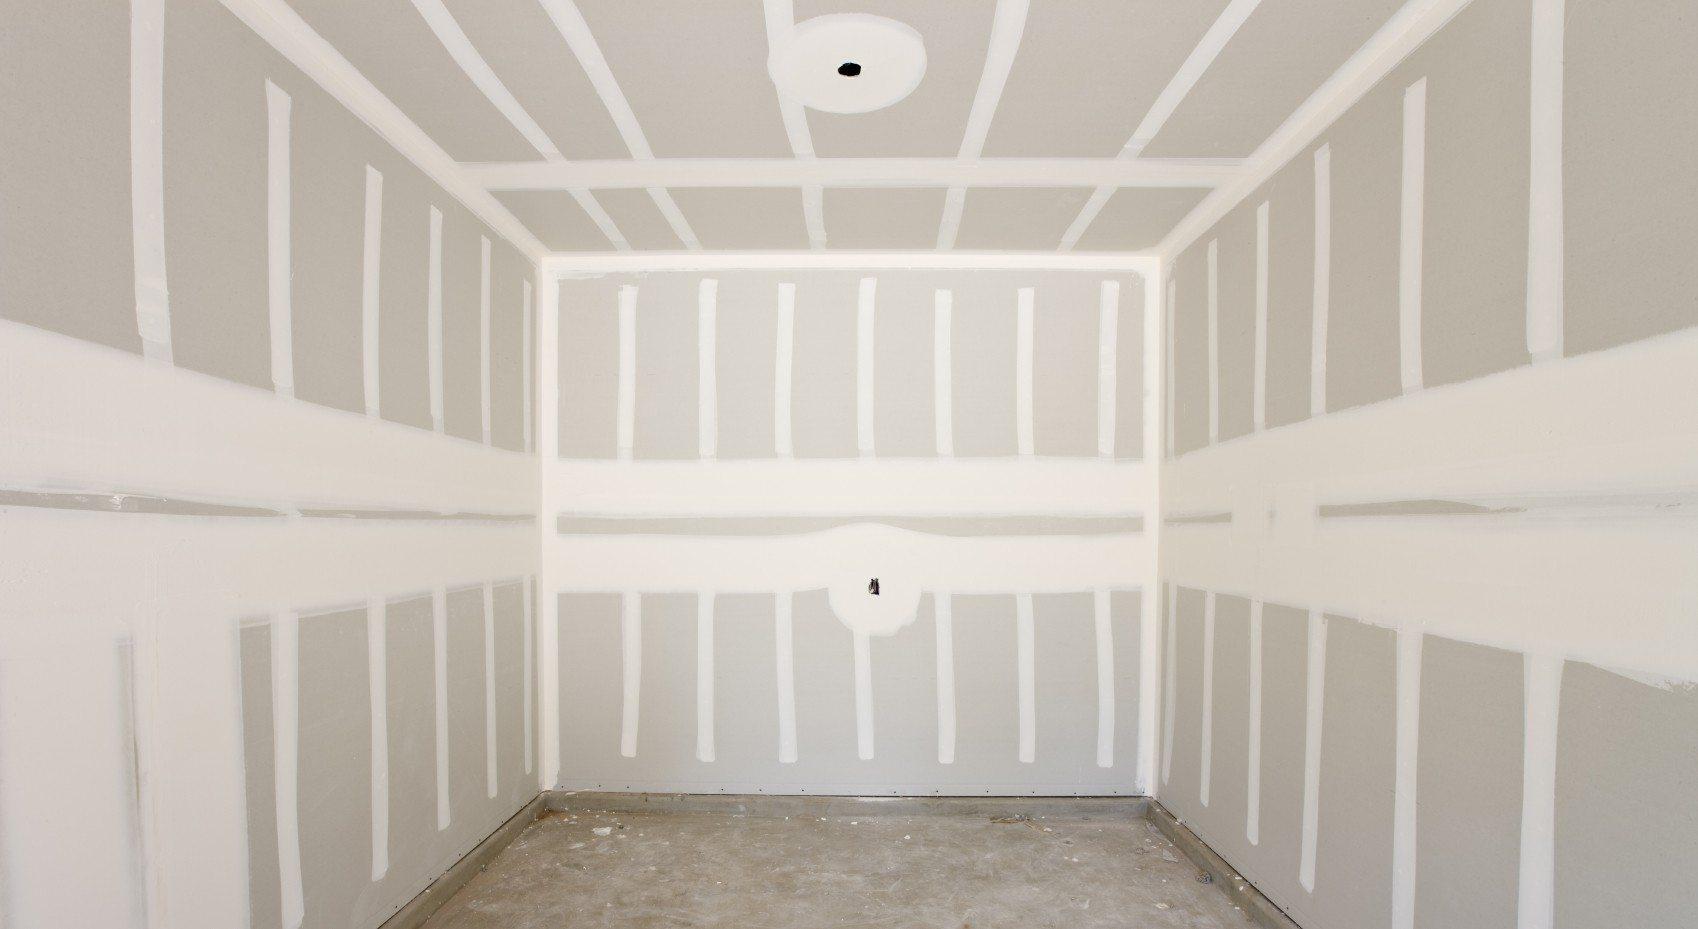 gypsum single parents C1396 - 17 standard specification for gypsum board , ceiling, coreboard, drywall, exterior gypsum soffit board, foil-backed, gypsum, gypsum.